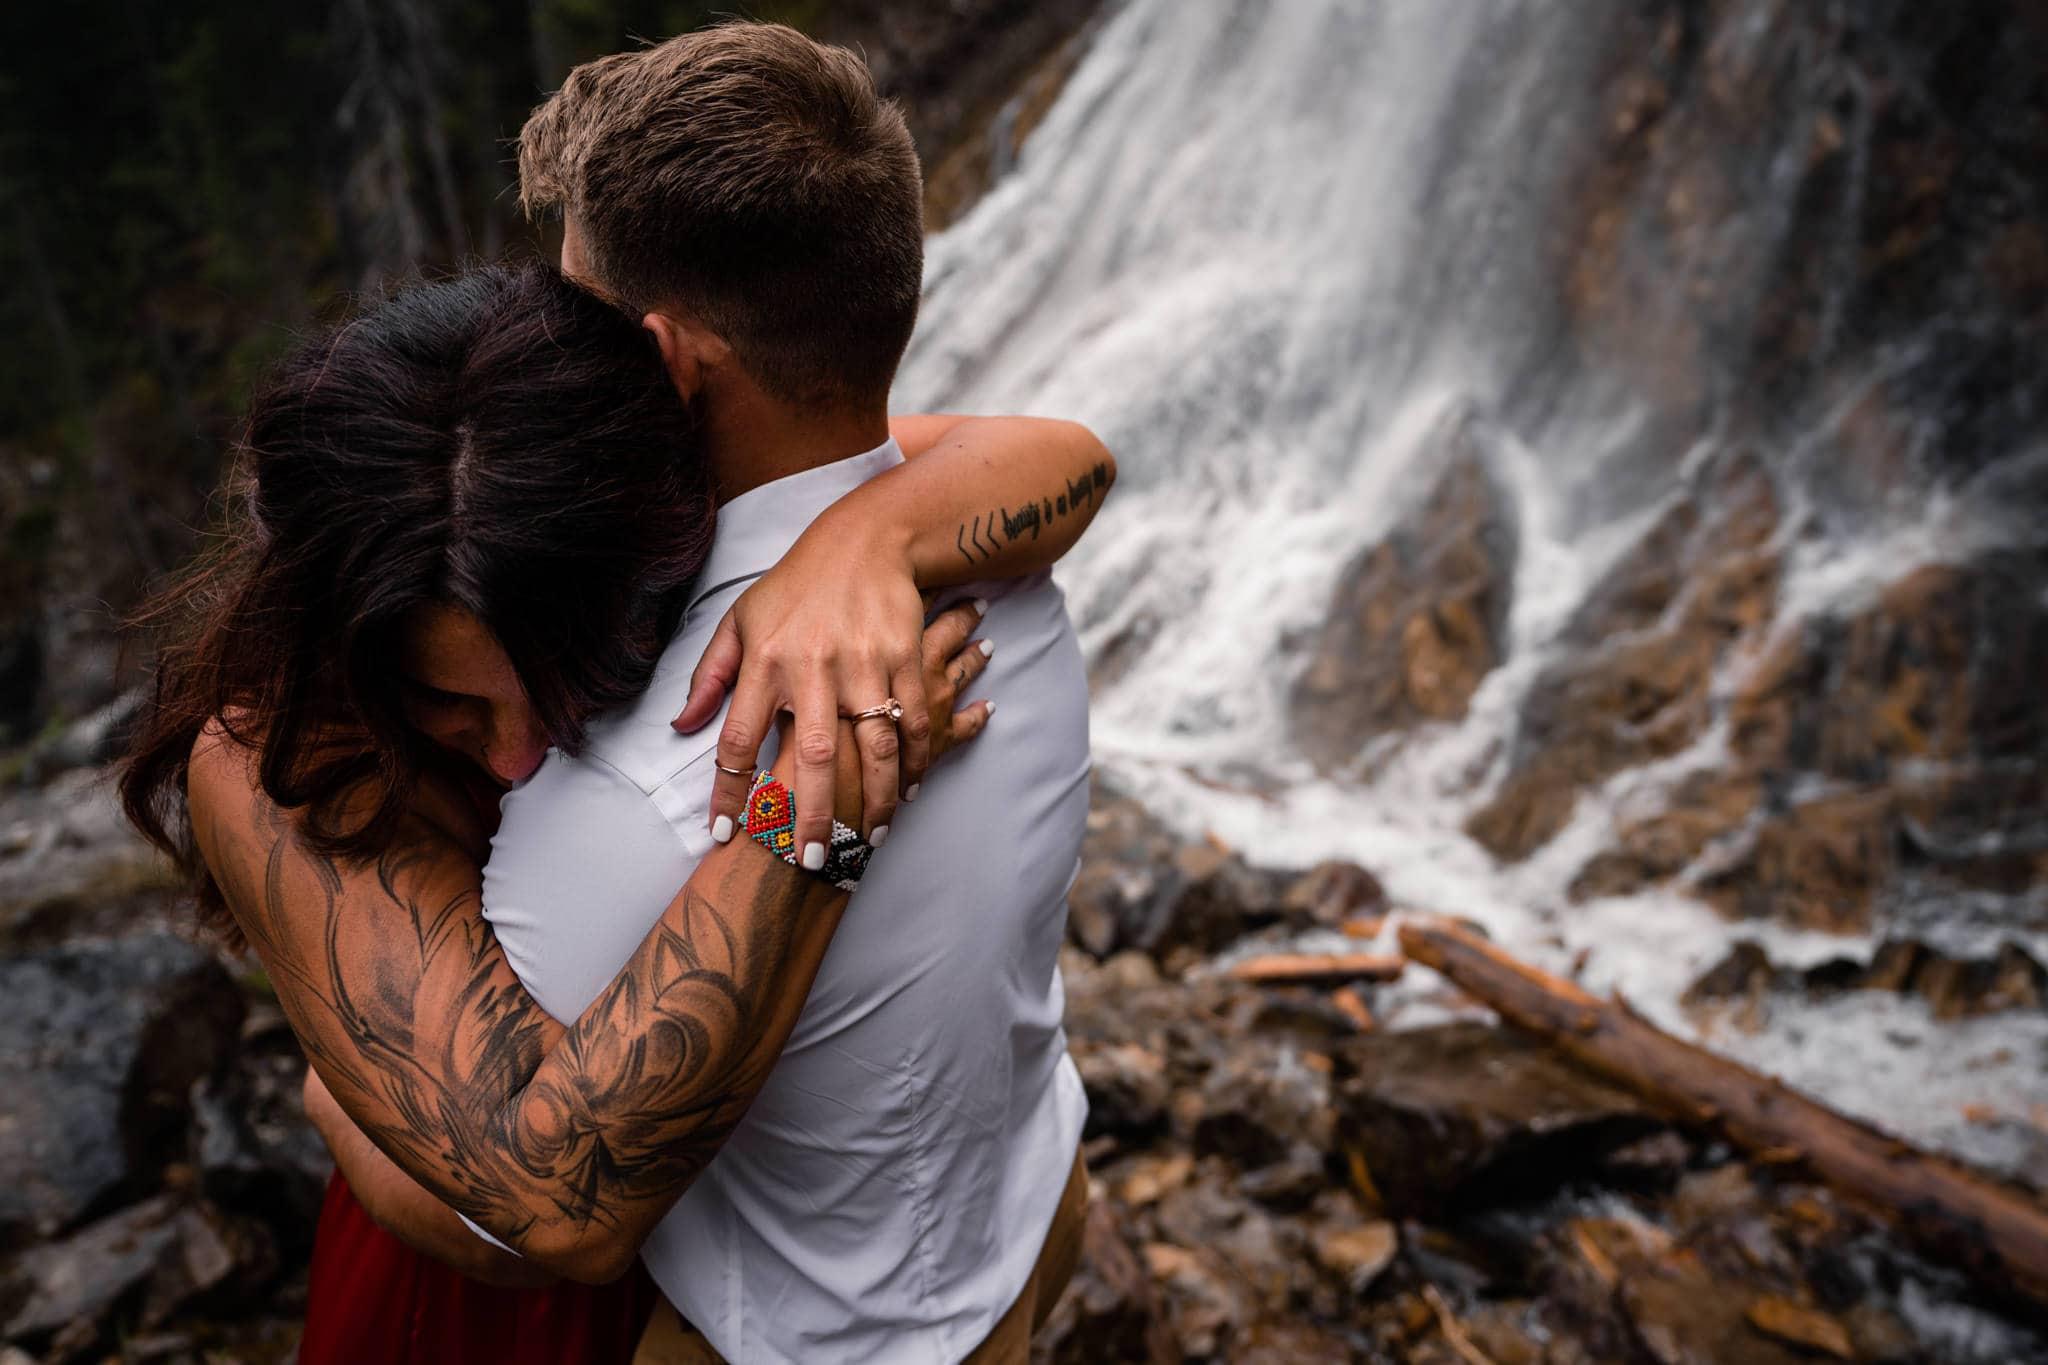 Studio 22 Photography - Destination Wedding Photographers